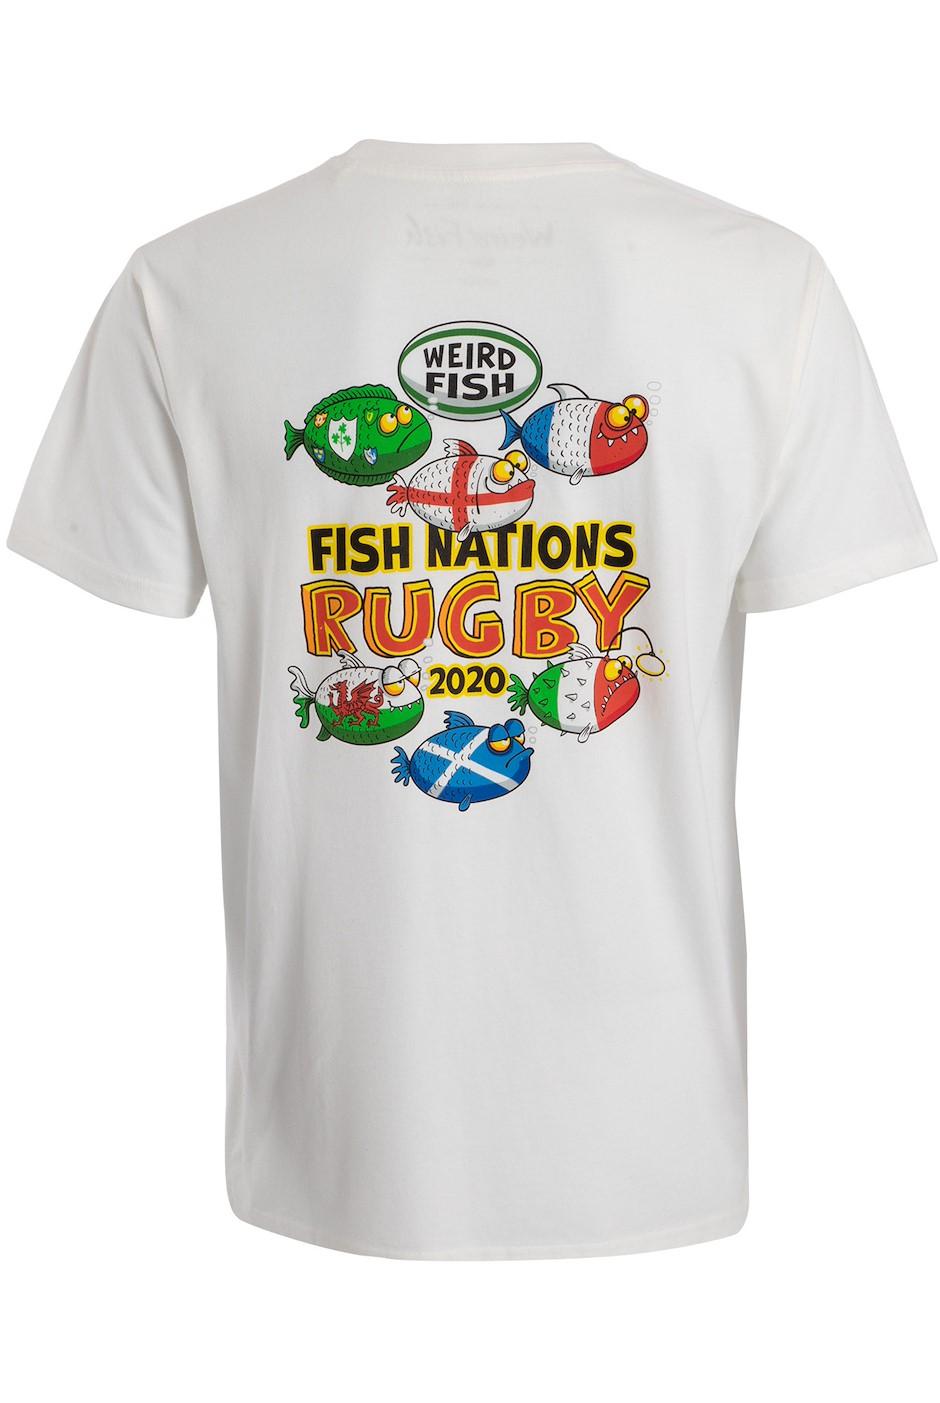 Fish Nations Artists T-Shirt Marshmallow